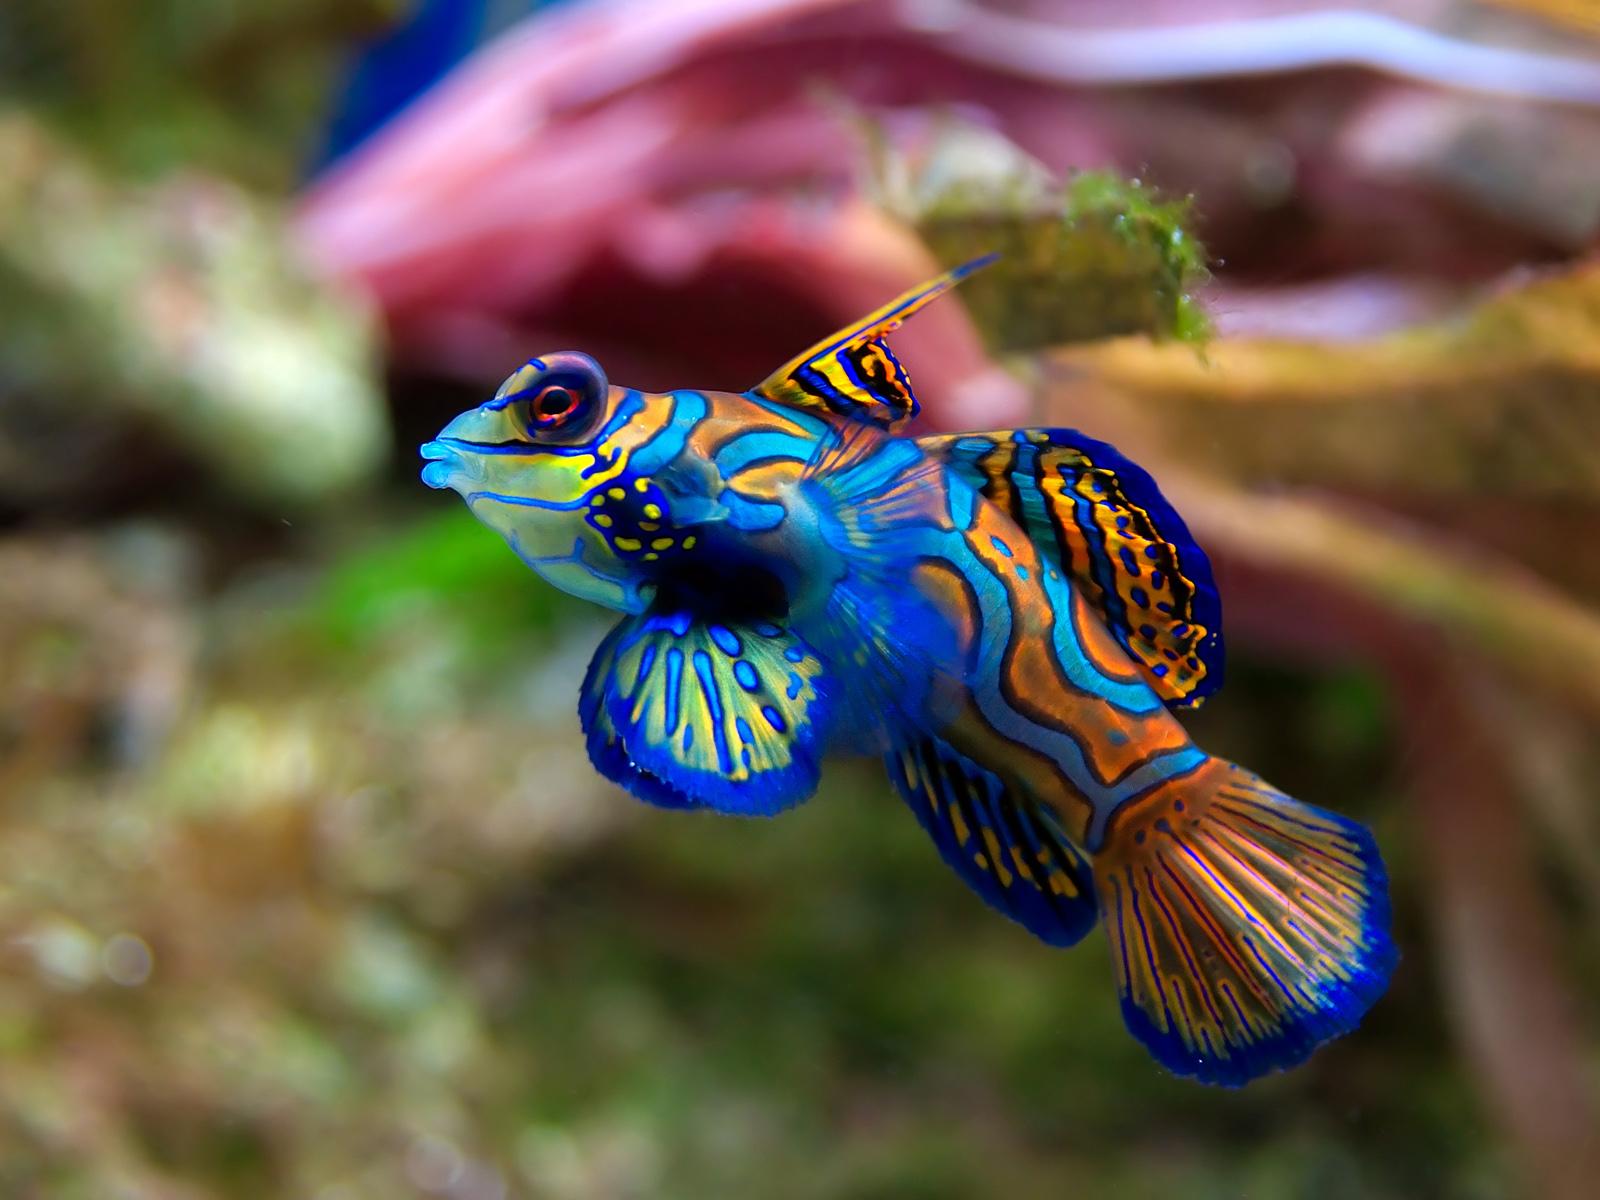 Fish aquarium in jayanagar - Z58